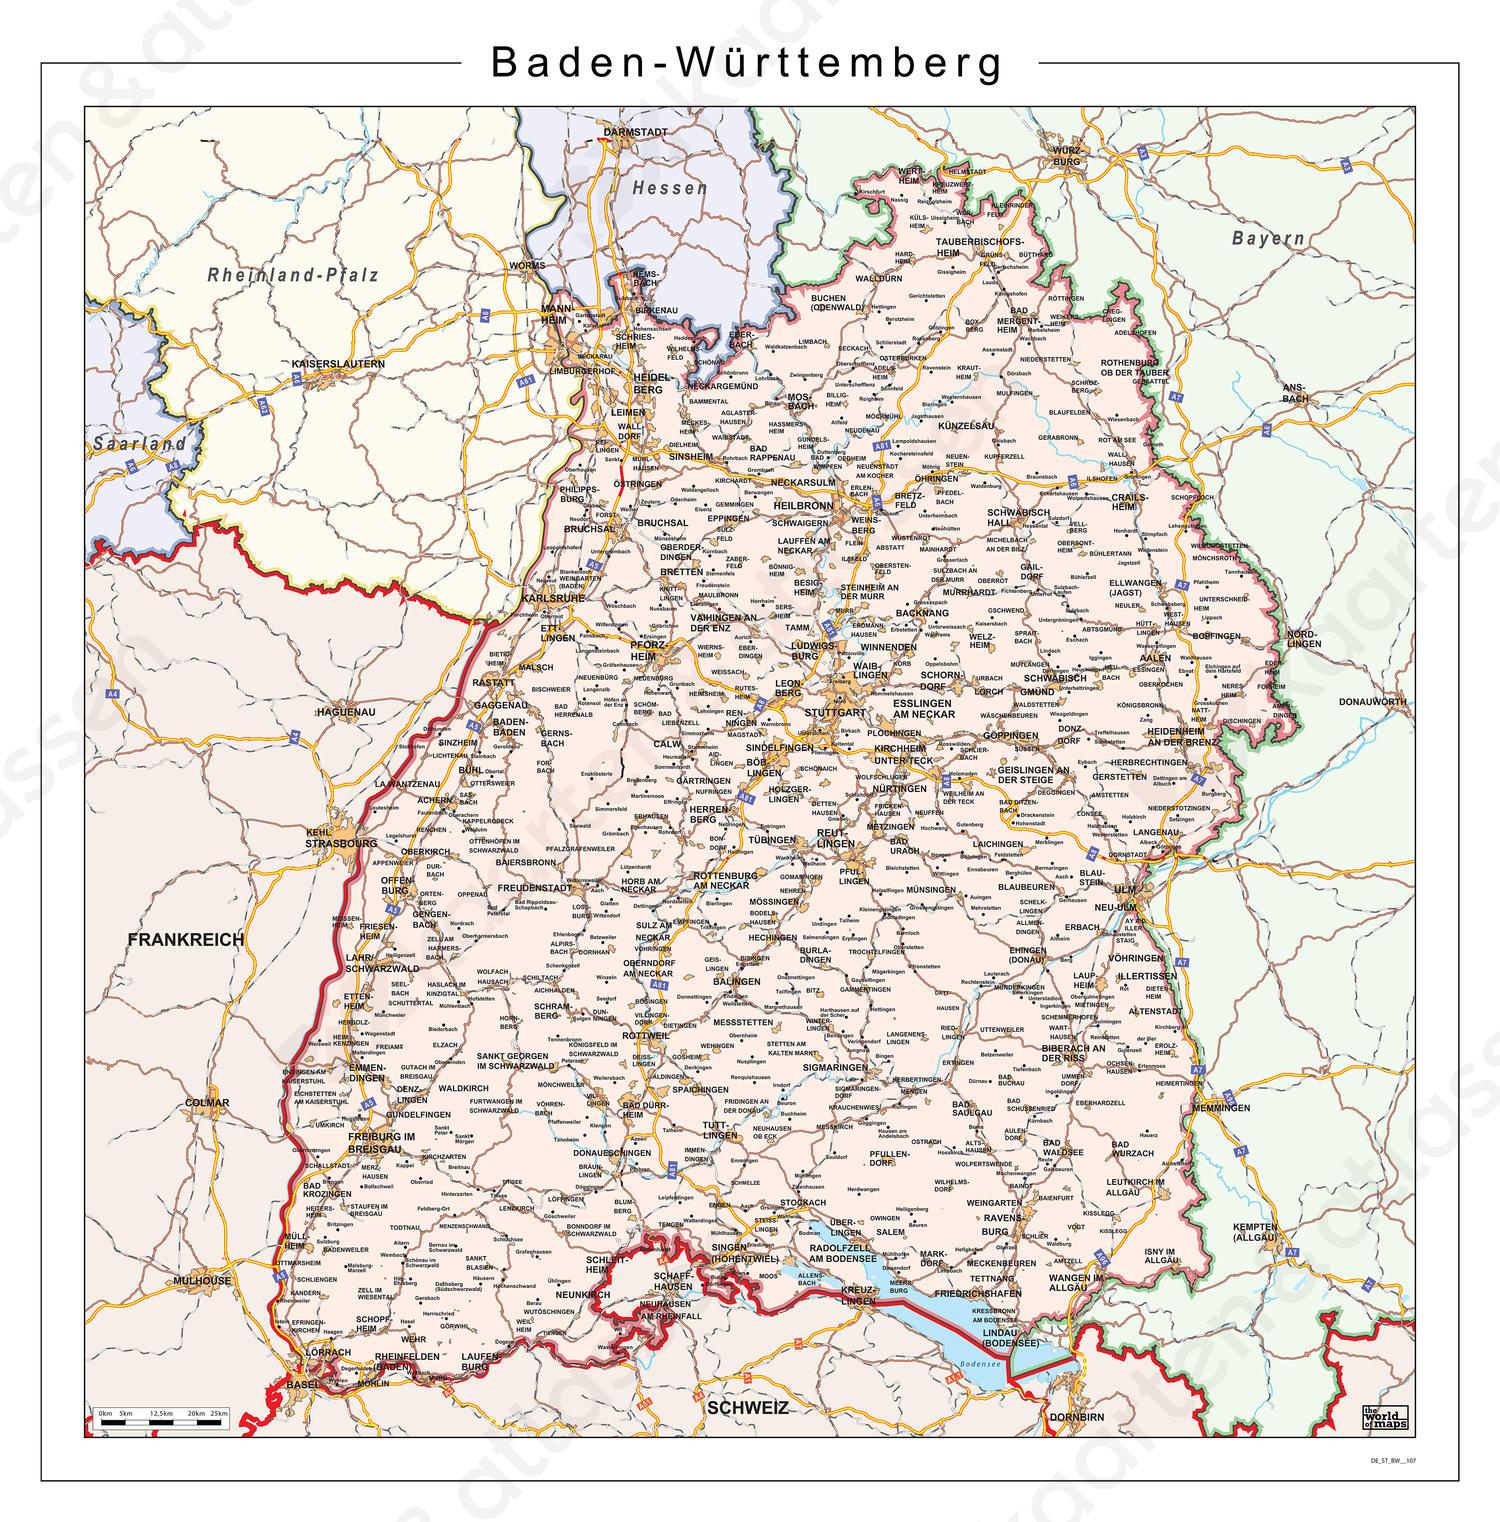 Baden-Württemberg 107